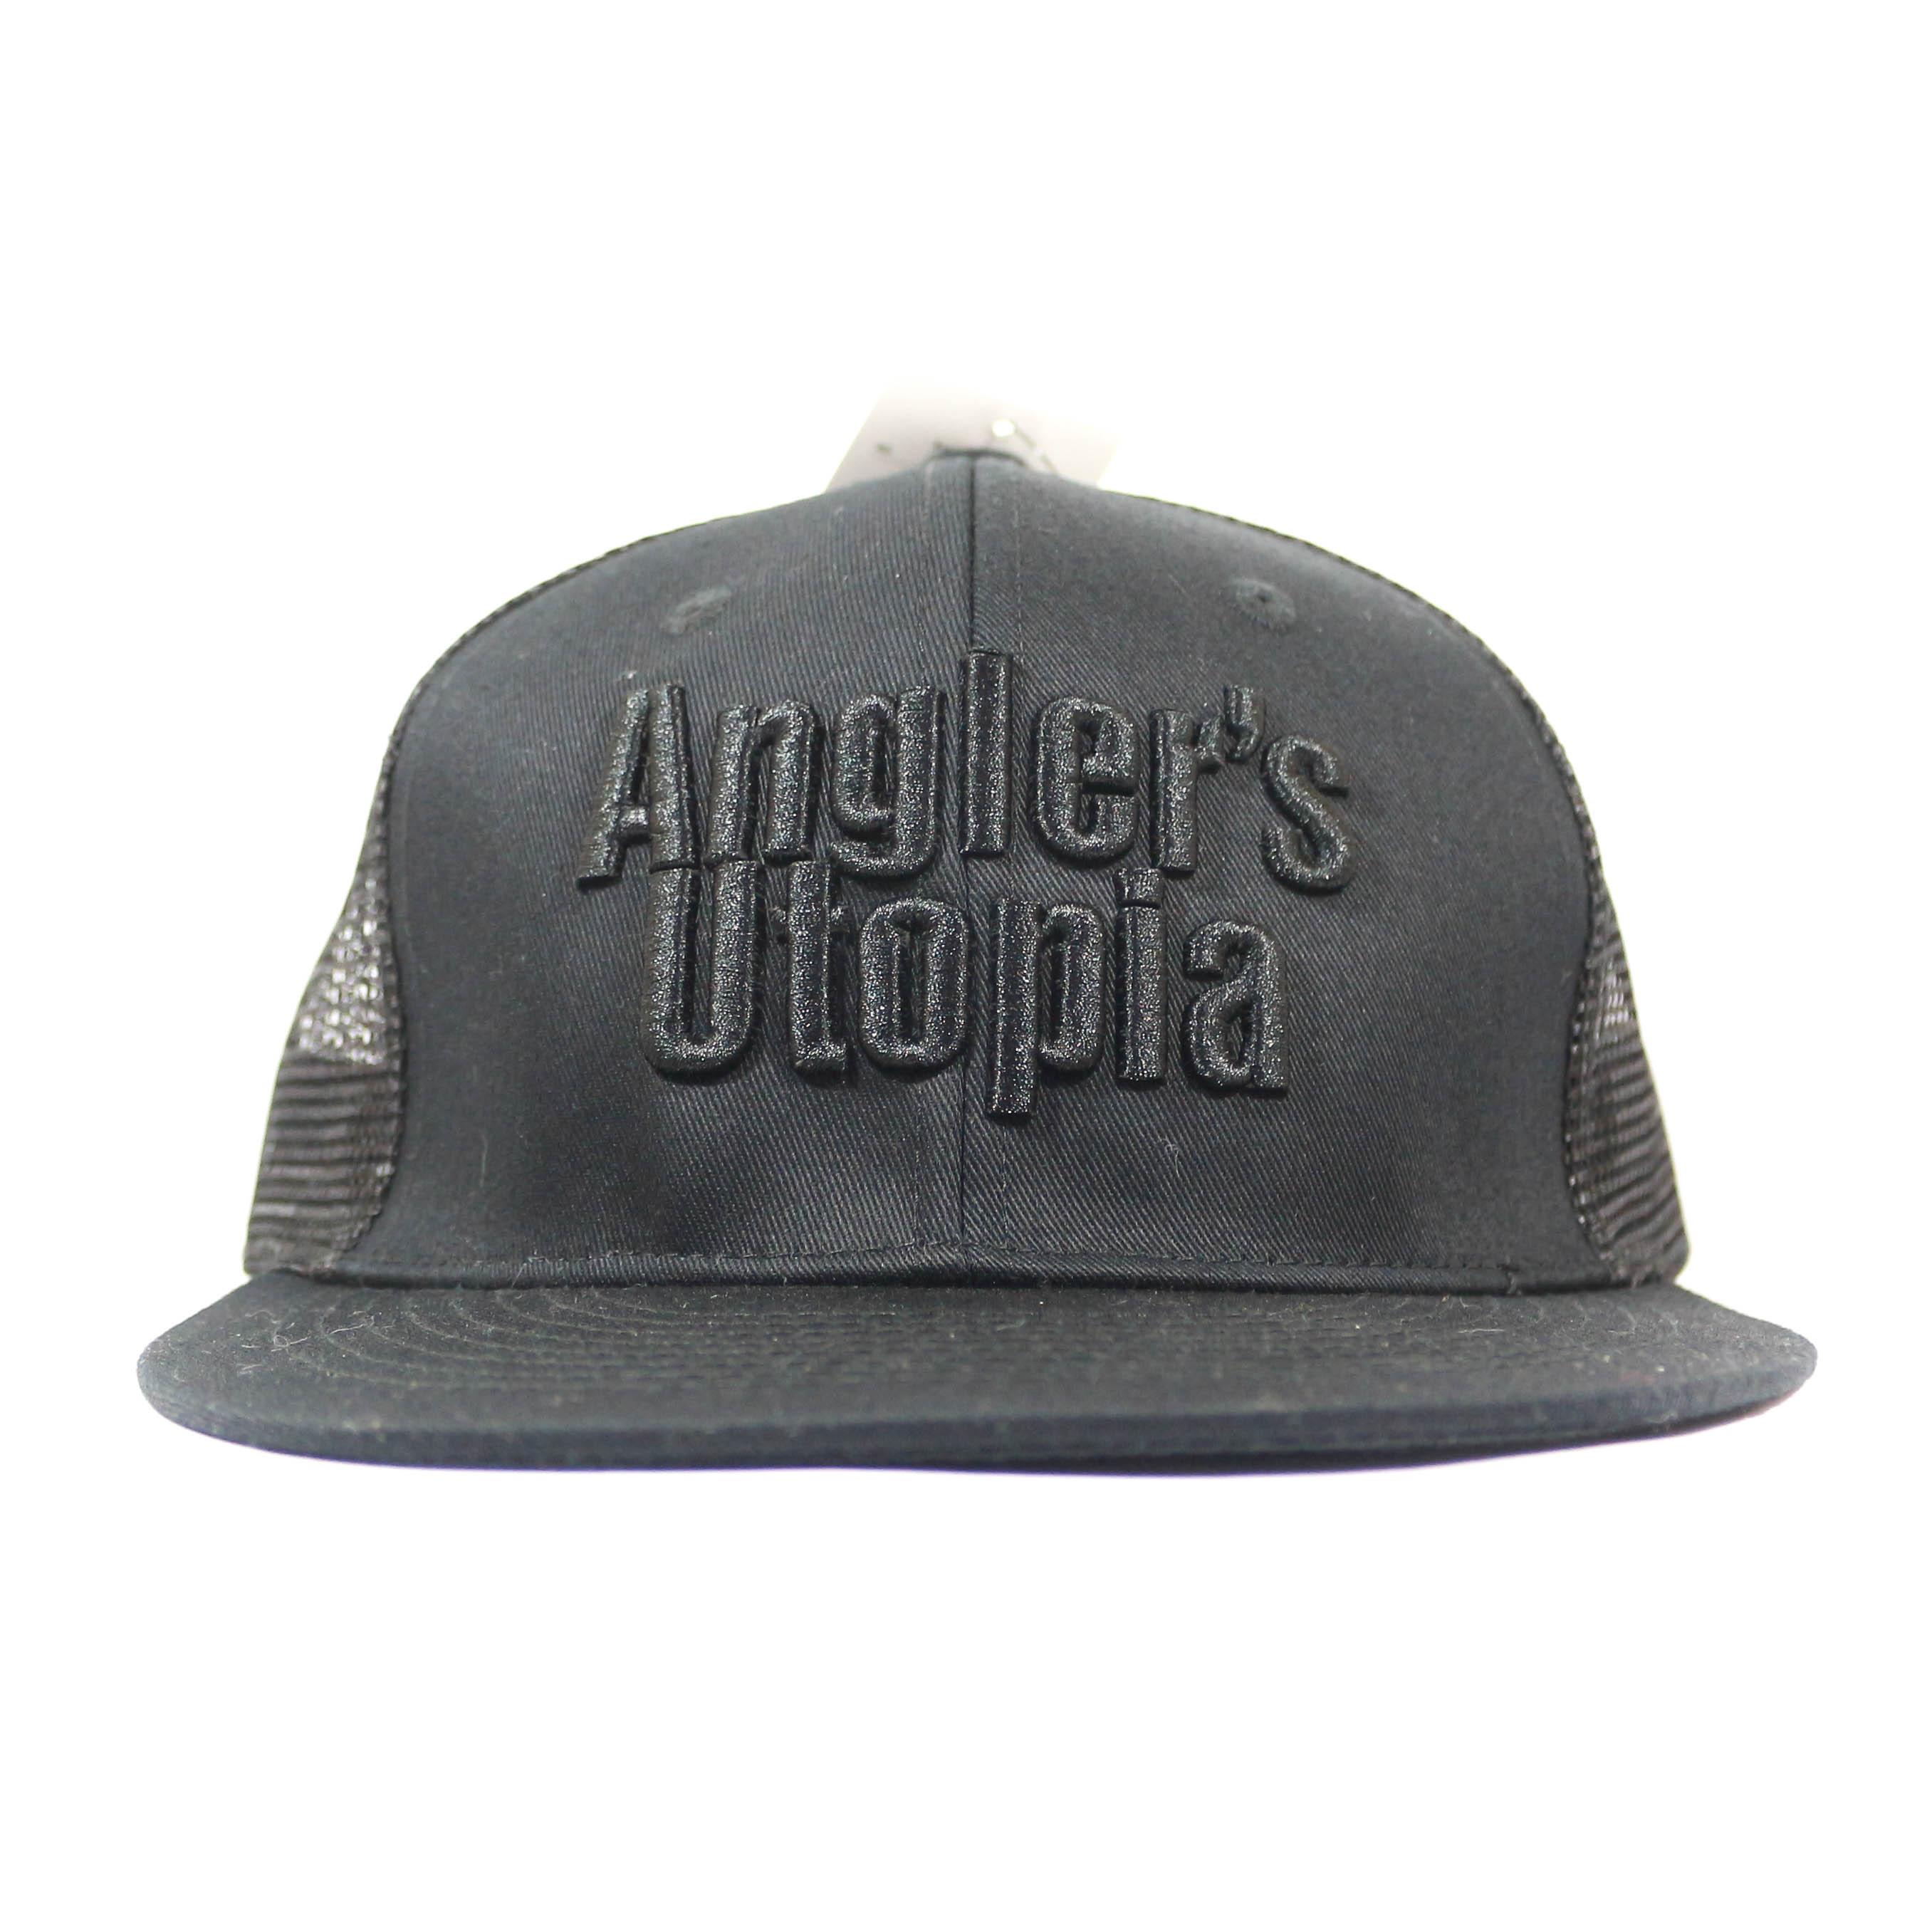 Apia Cap Flat Mesh Cap Free Size Black Black (9884)